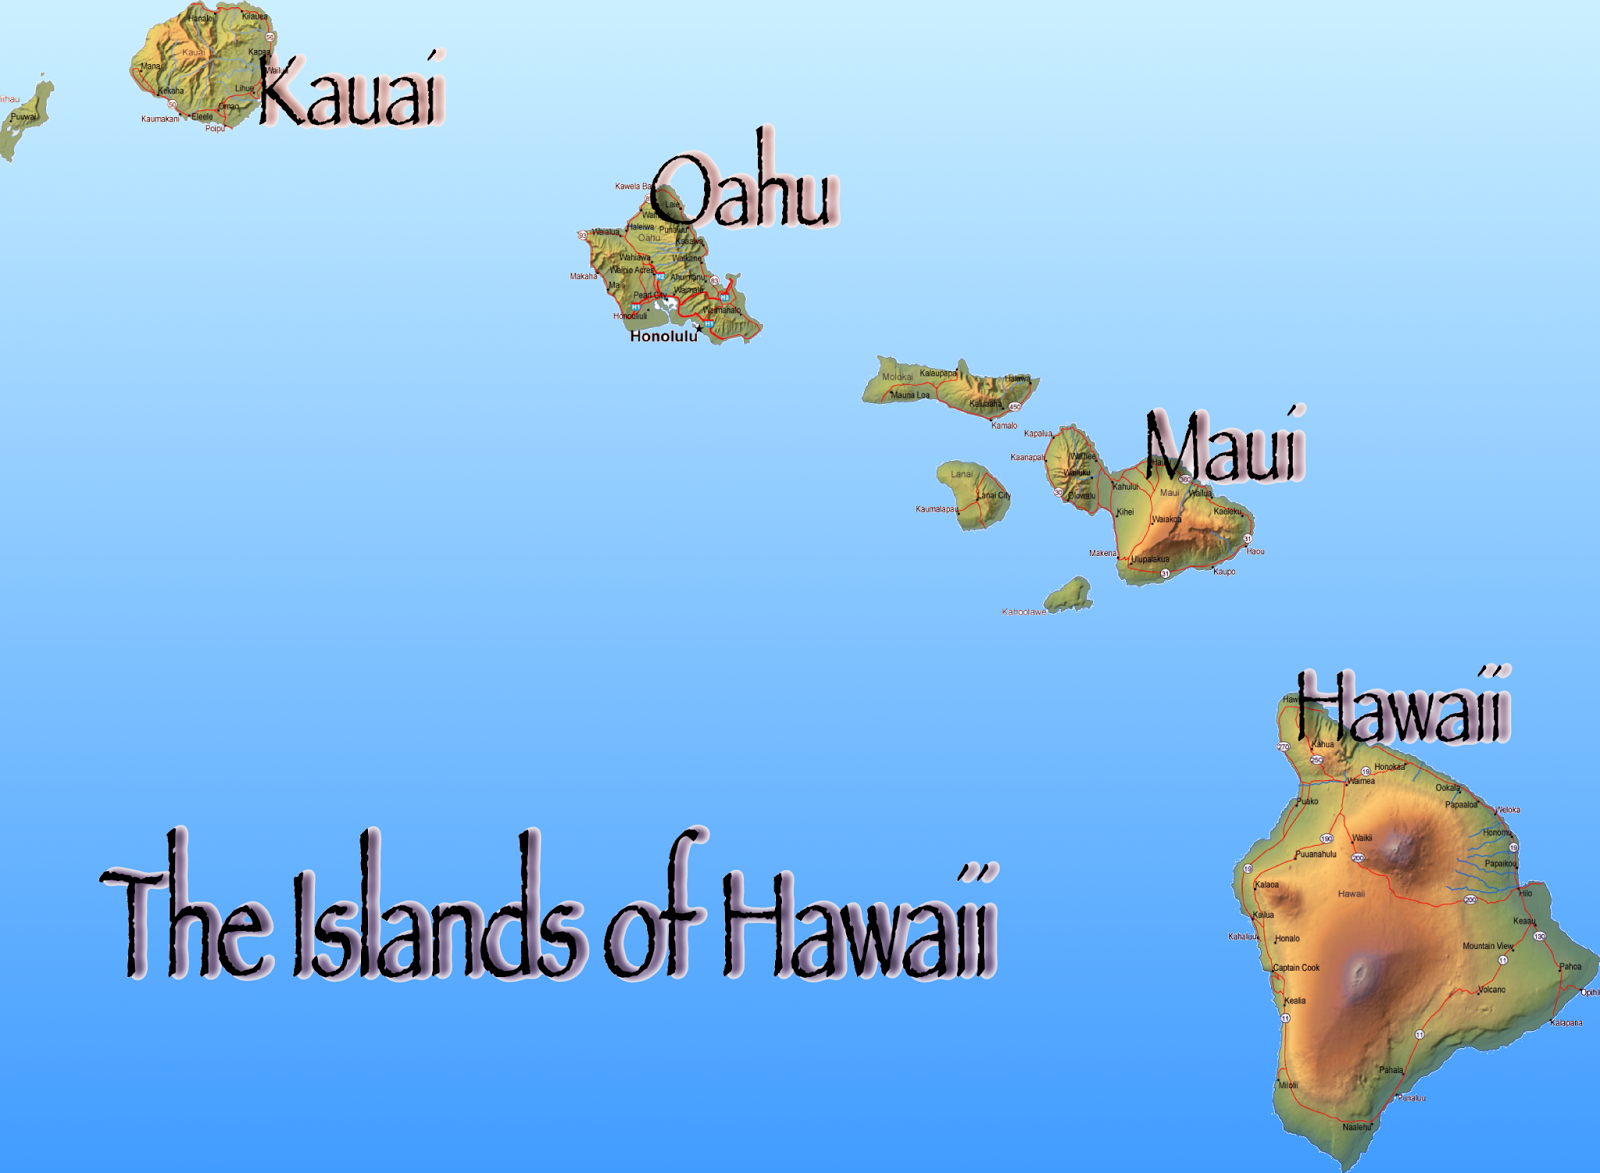 Map Of Hawaii Island Chain Swimnovacom - Map of hawaii